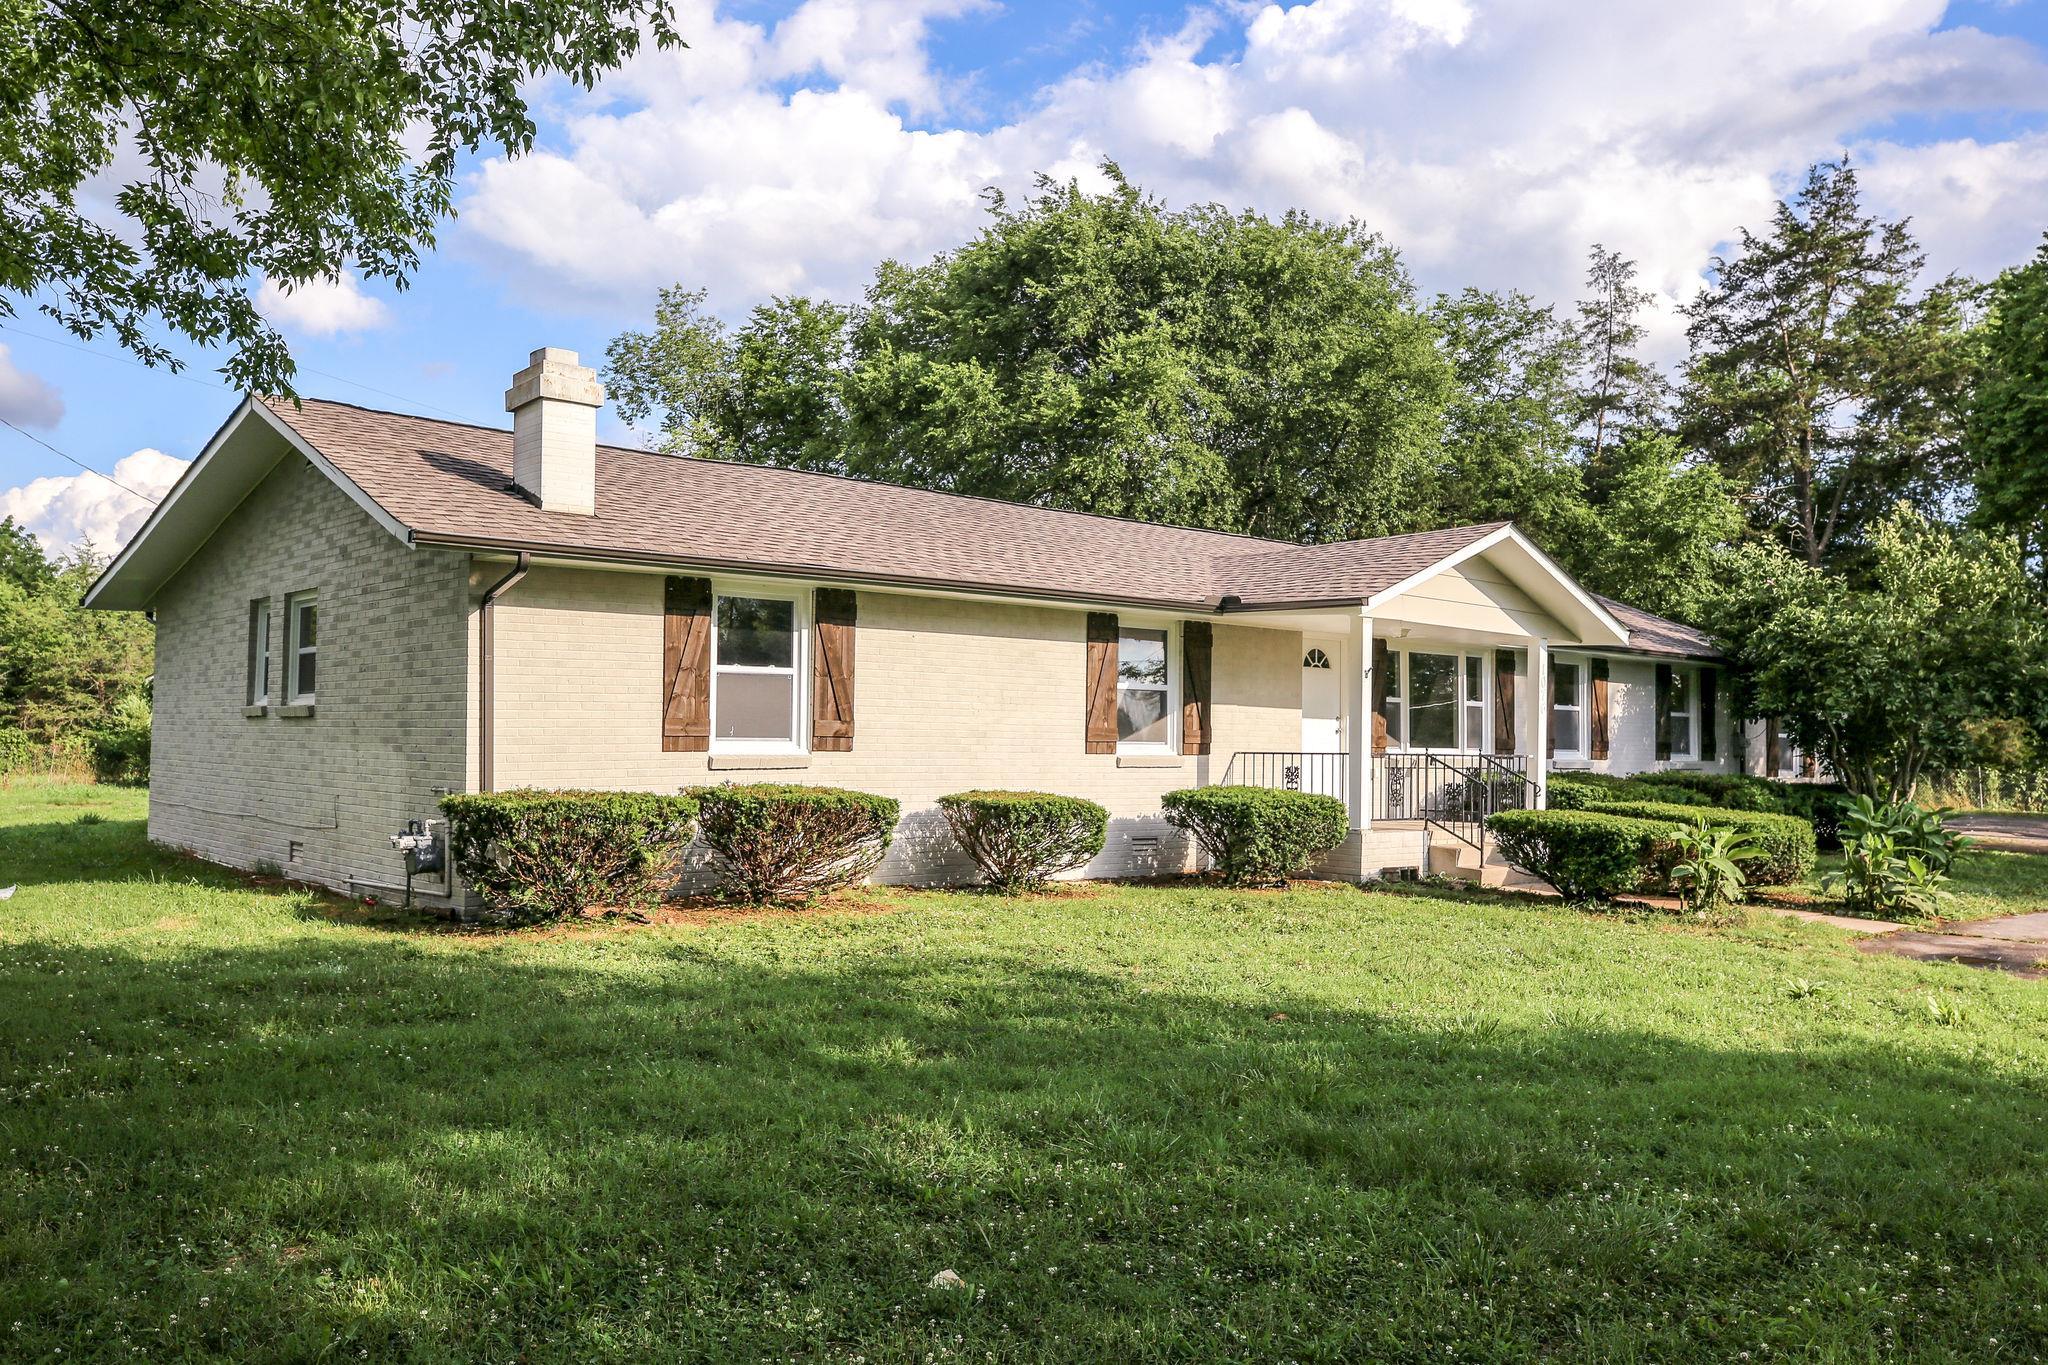 1076 Twin Oak Dr, N, Murfreesboro, TN 37130 - Murfreesboro, TN real estate listing